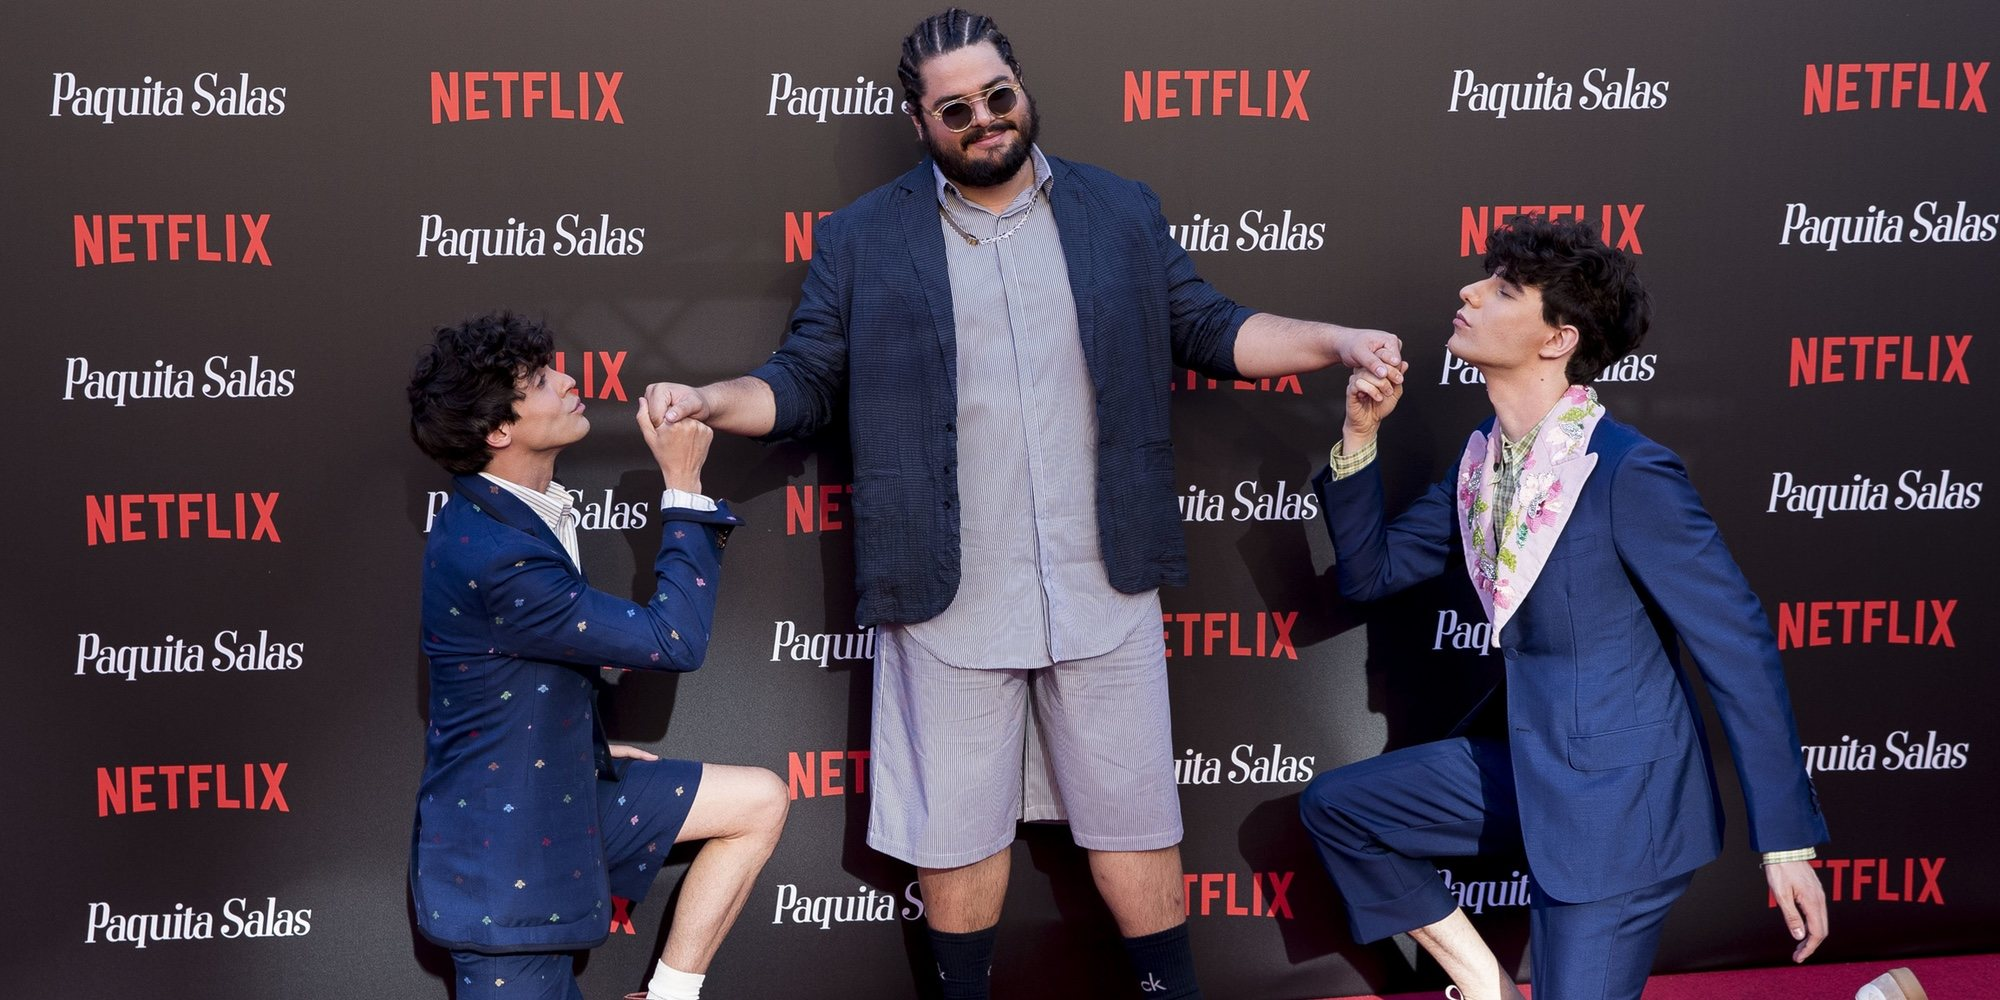 La tercera temporada de 'Paquita Salas', llena de caras nuevas: de Úrsula Corberó a concursantes de 'OT 2018'